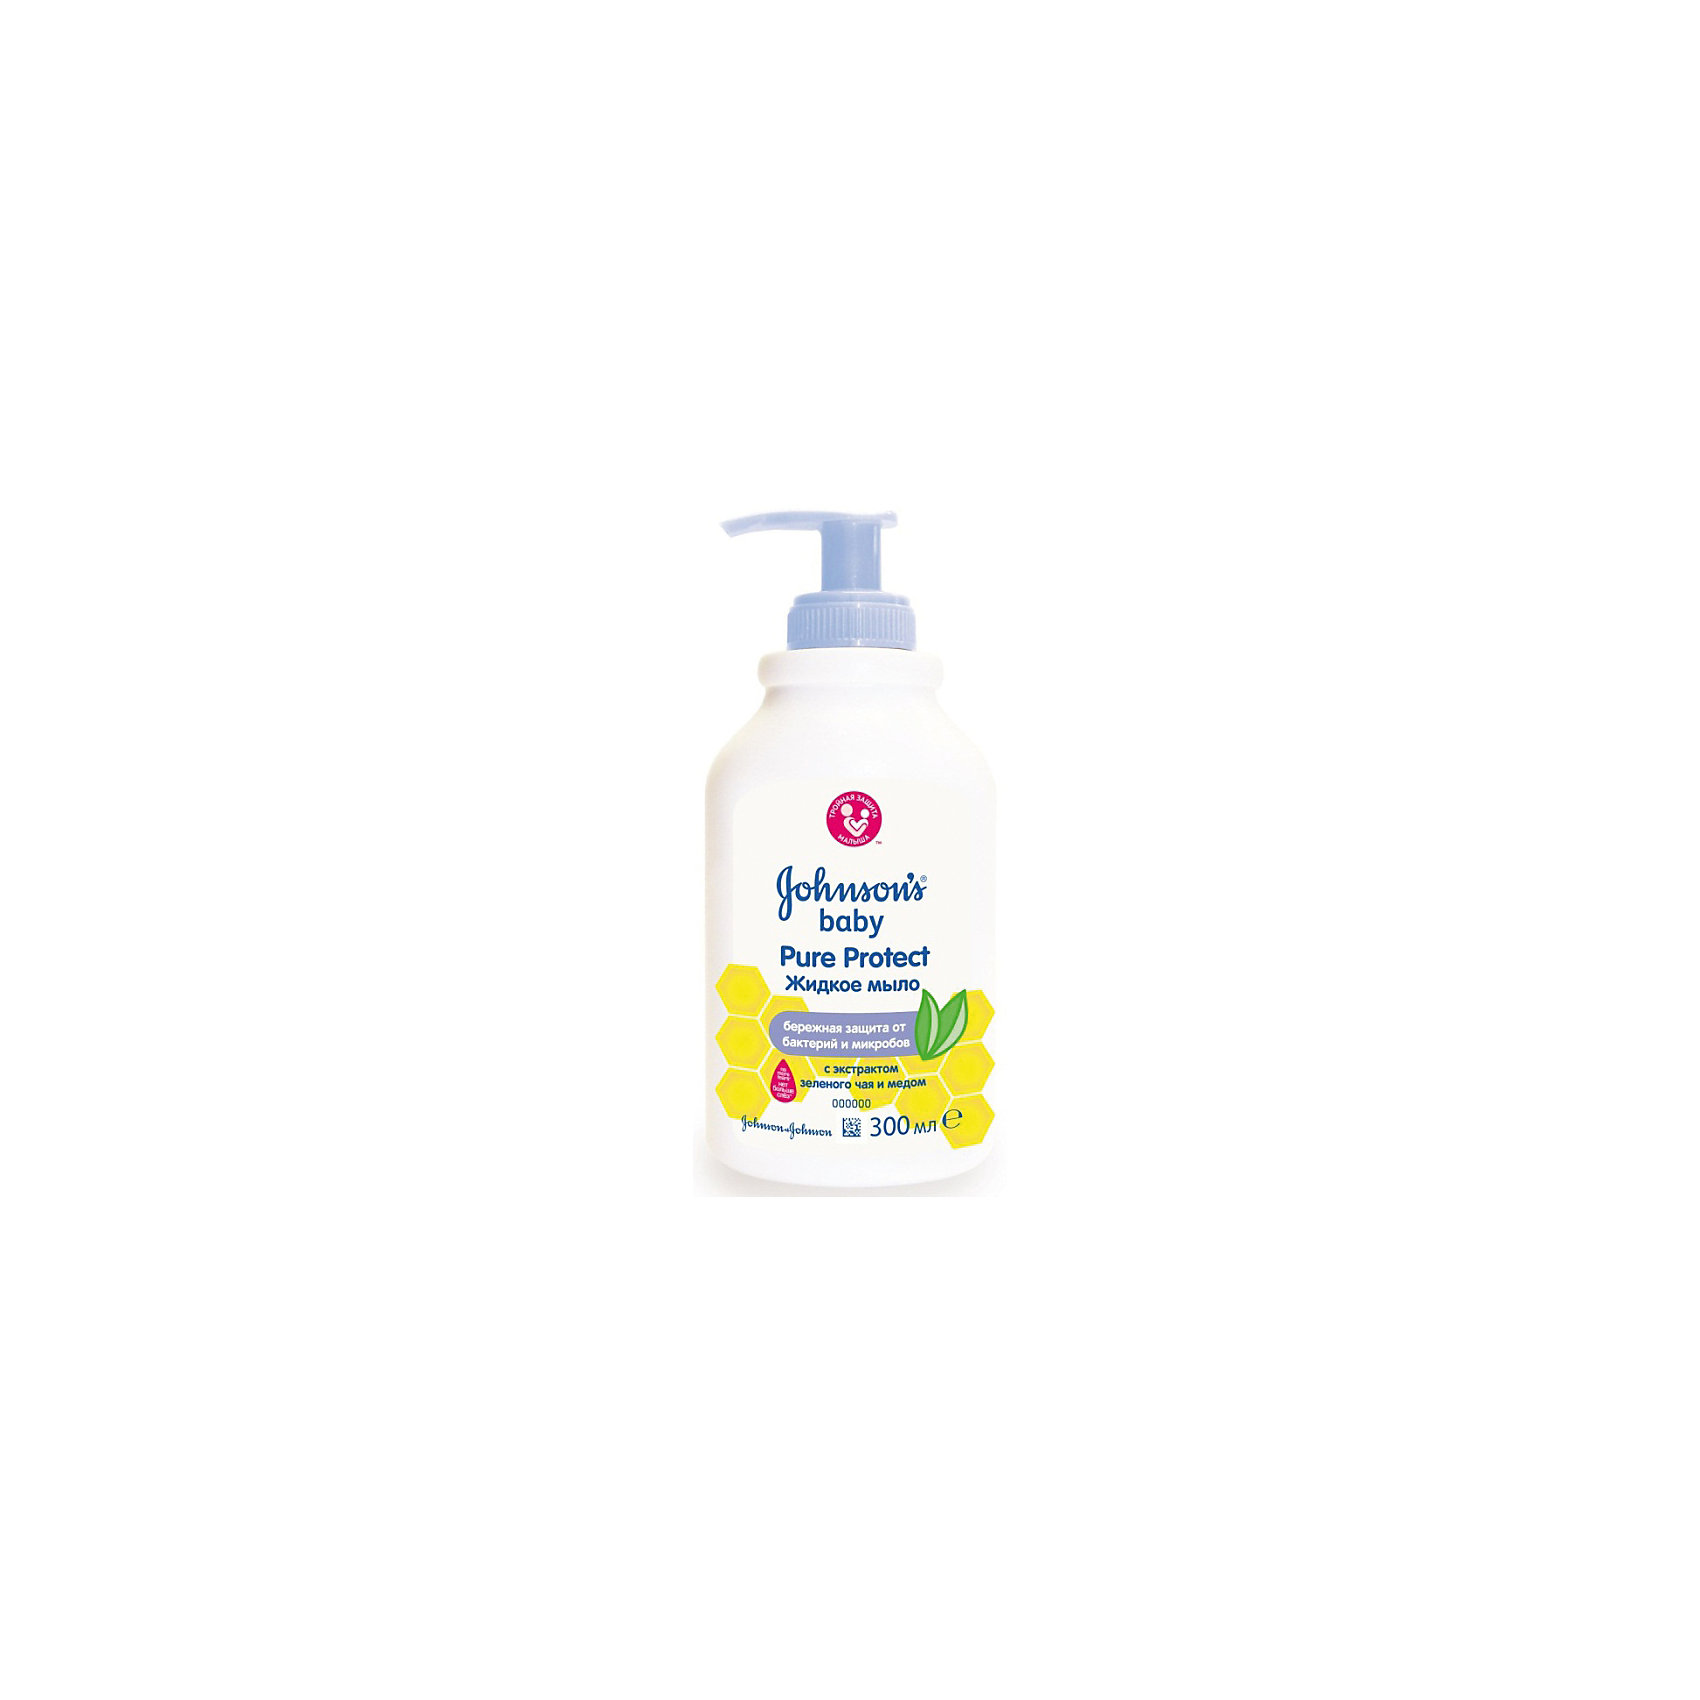 цены Johnson`s baby Жидкое мыло 2 в 1 для мытья рук и тела Pure Protect 300 мл, Johnson`s baby